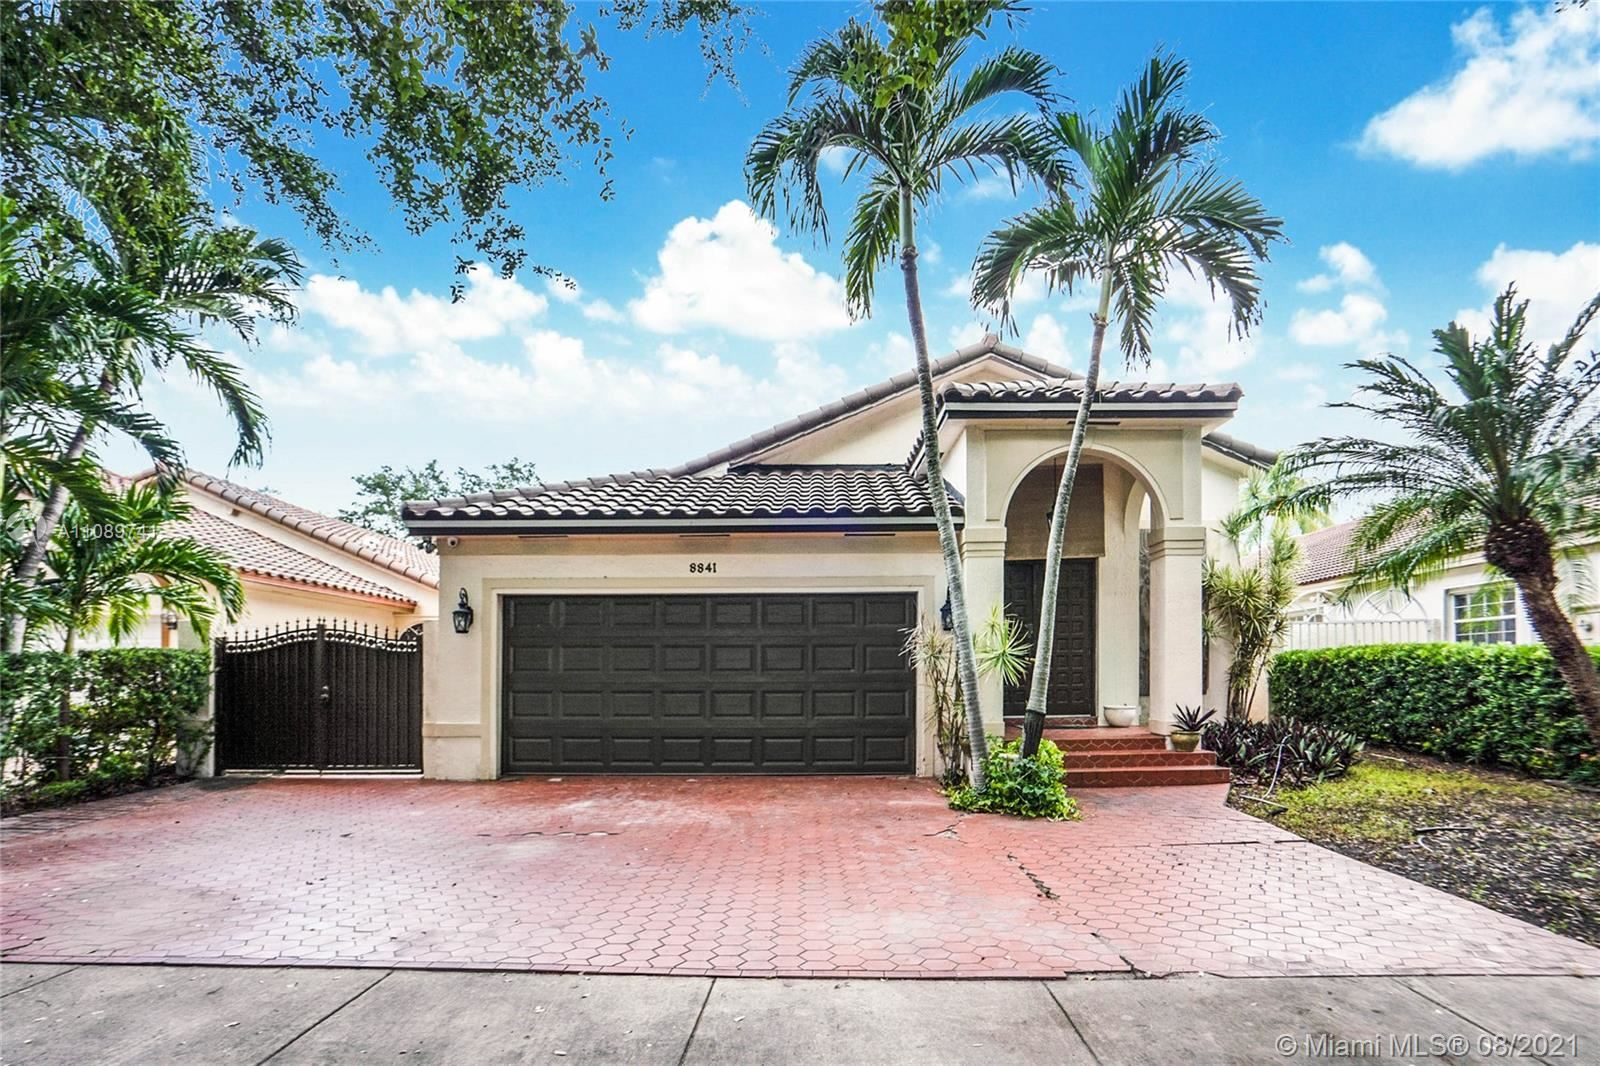 8841 NW 153rd Ter, Miami Lakes, FL 33018 - #: A11089741